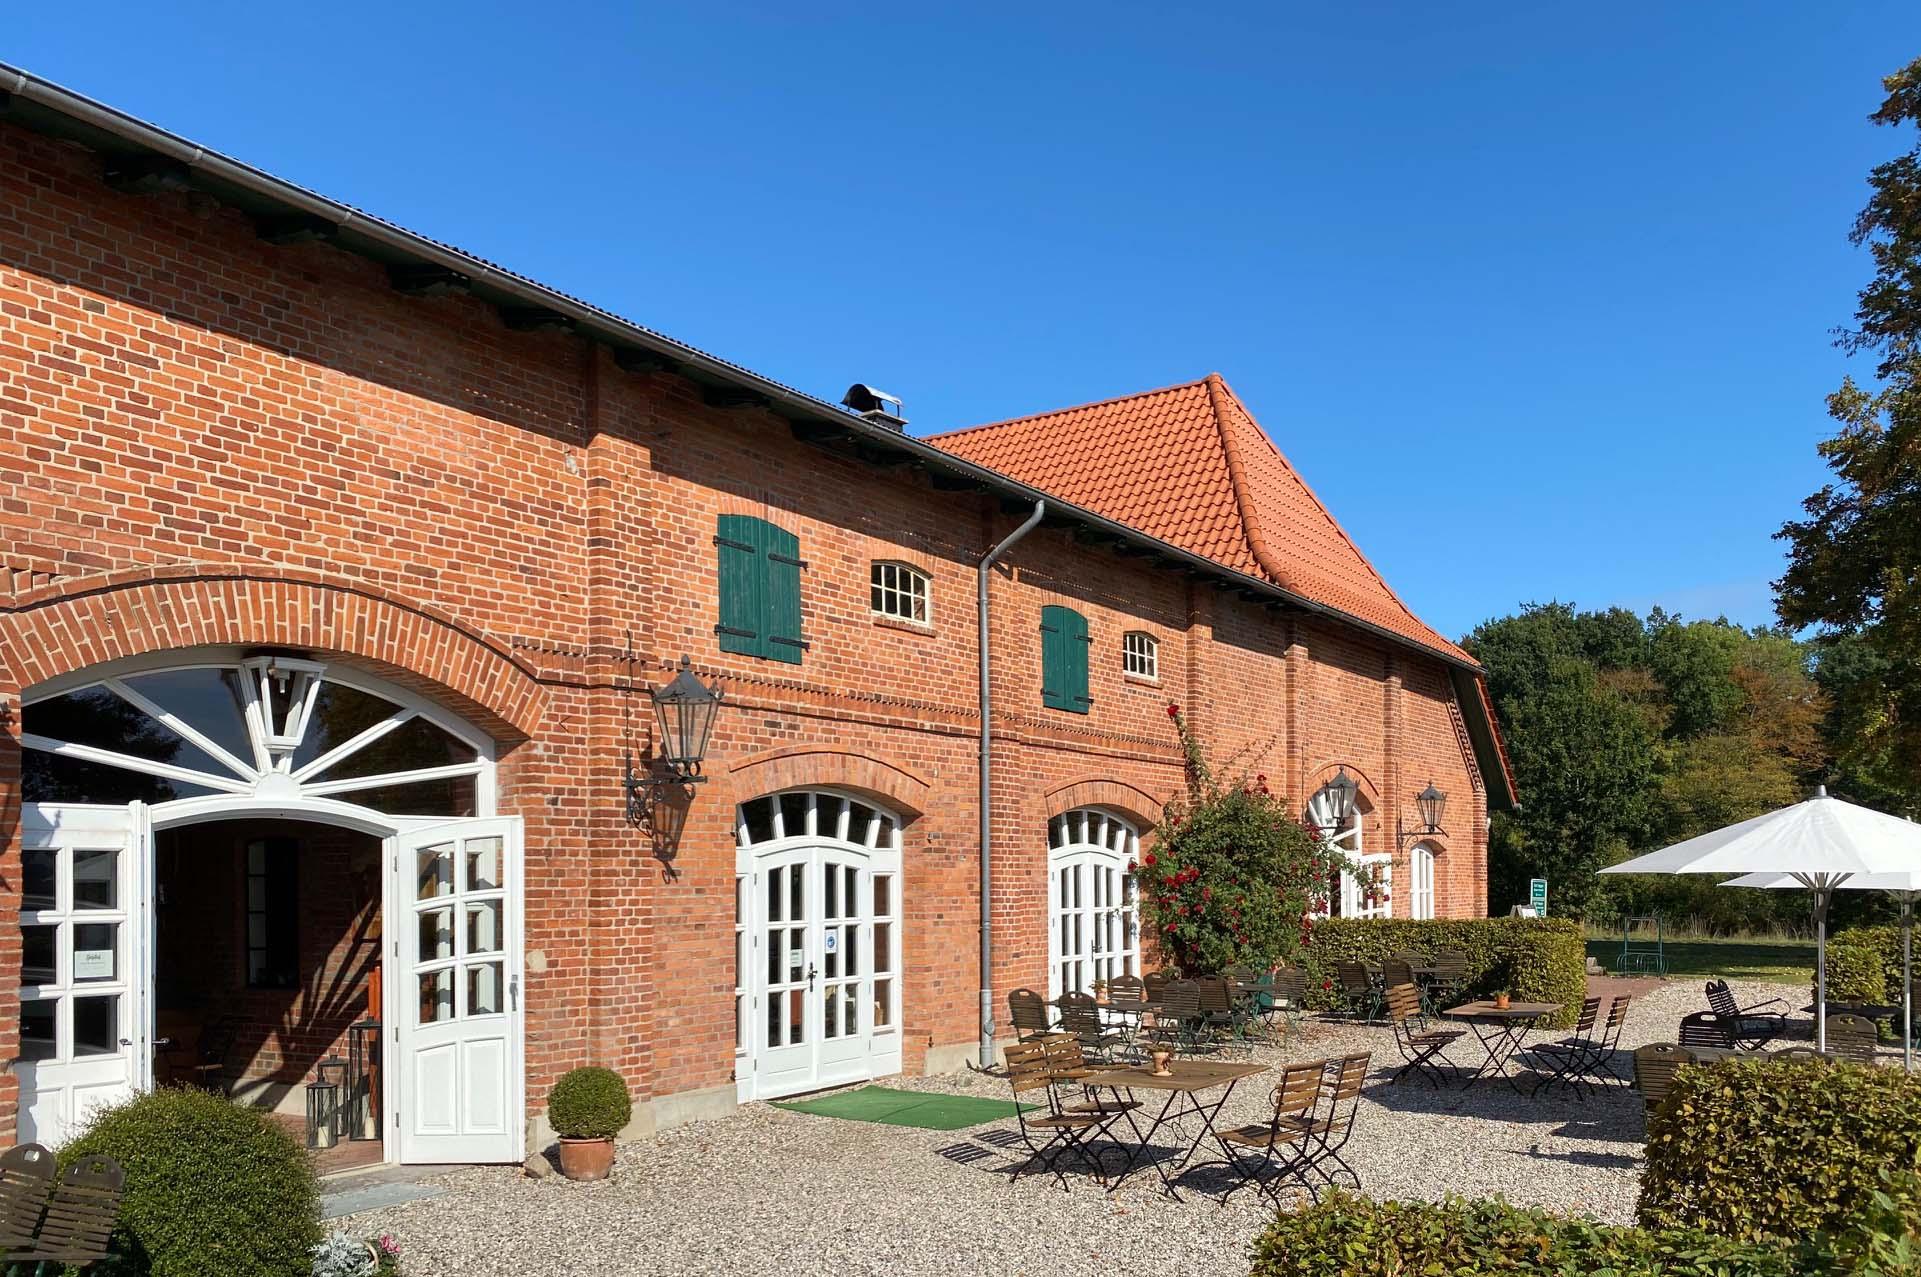 Café zum Ziegelhof - Außensitzplätze